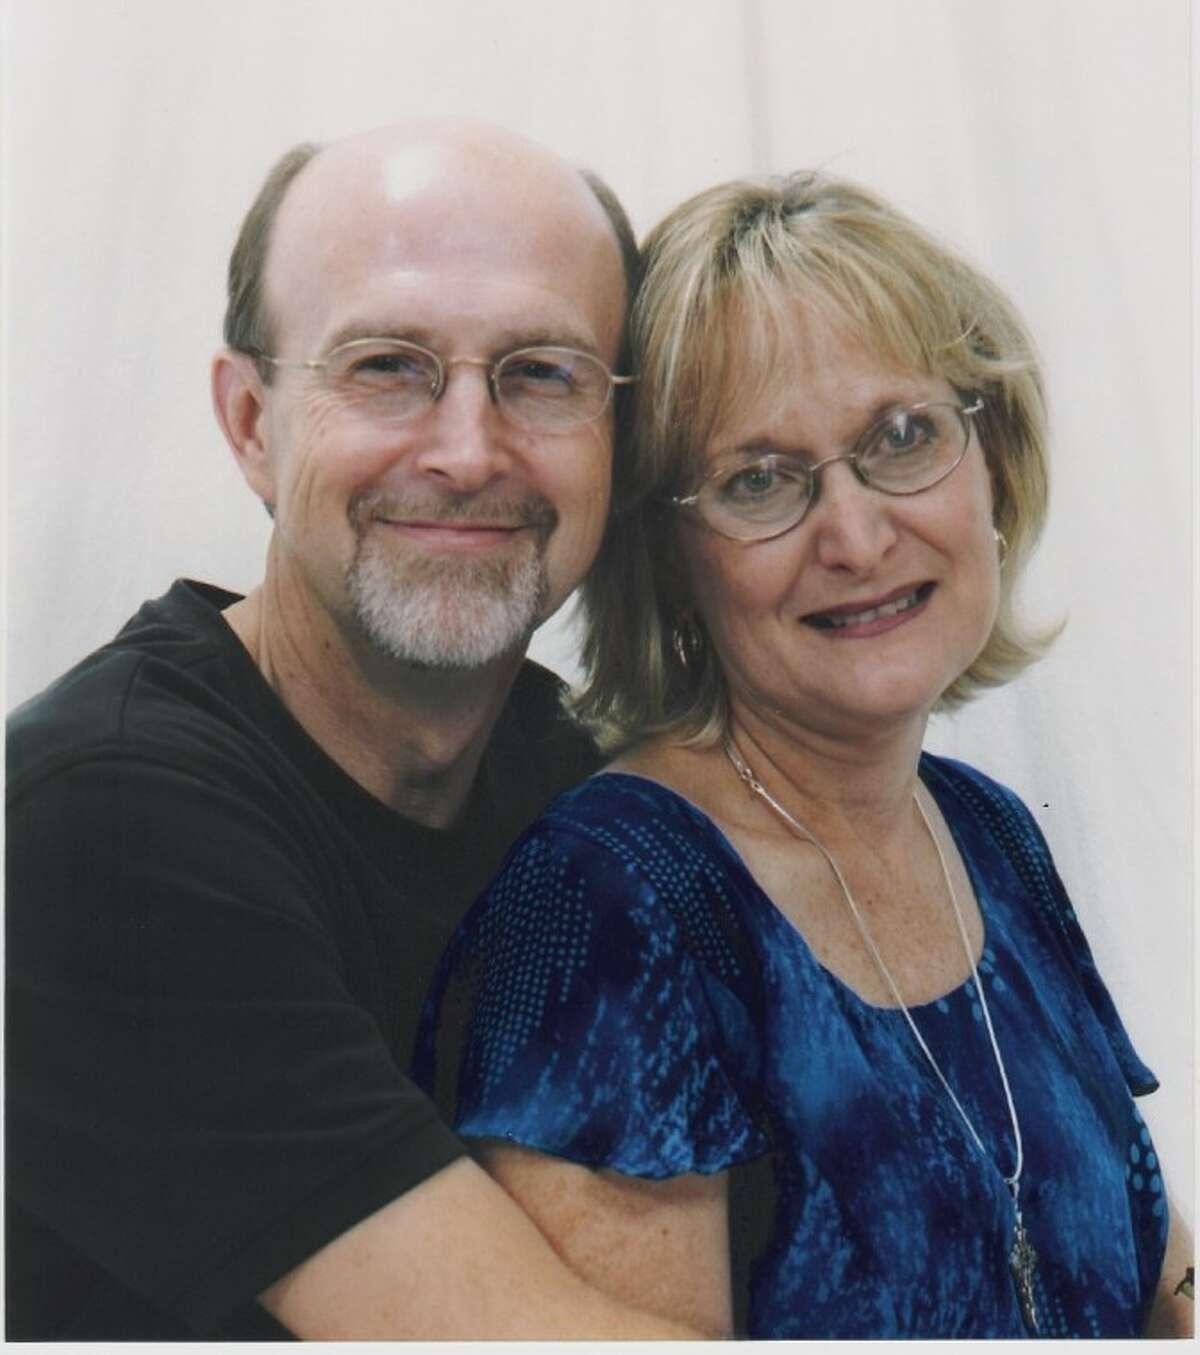 Pastors Doug and Pam Runyan served Lake Houston Church for nearly 13 years.